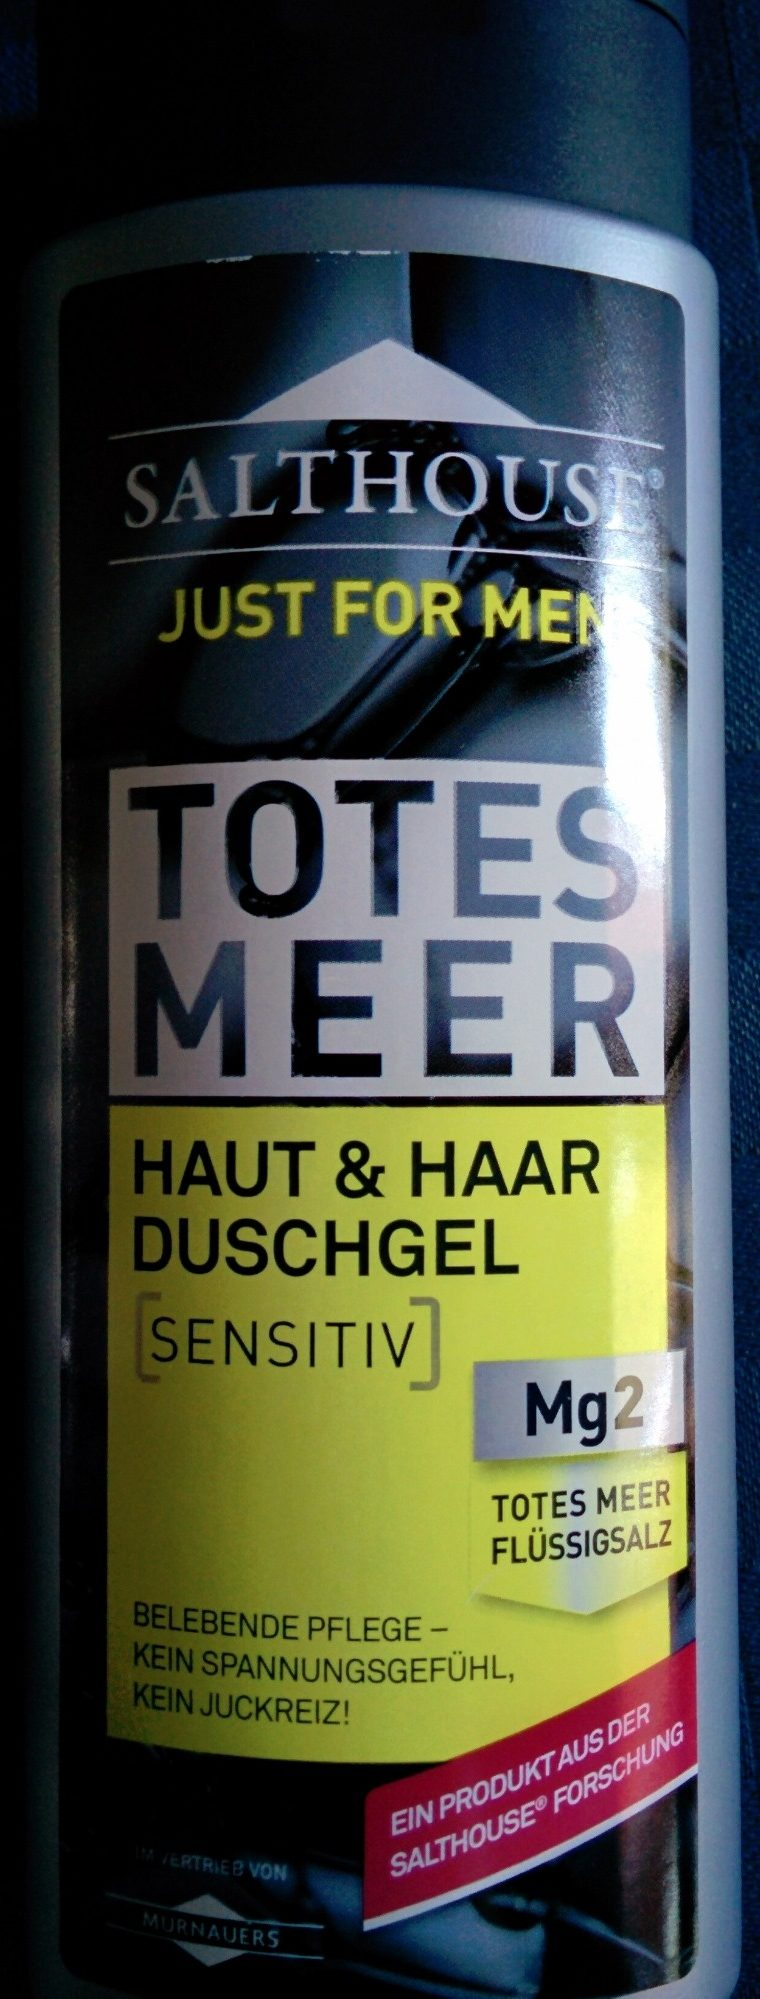 Totes Meer Haut & Haar Duschgel sinsitiv - Product - de